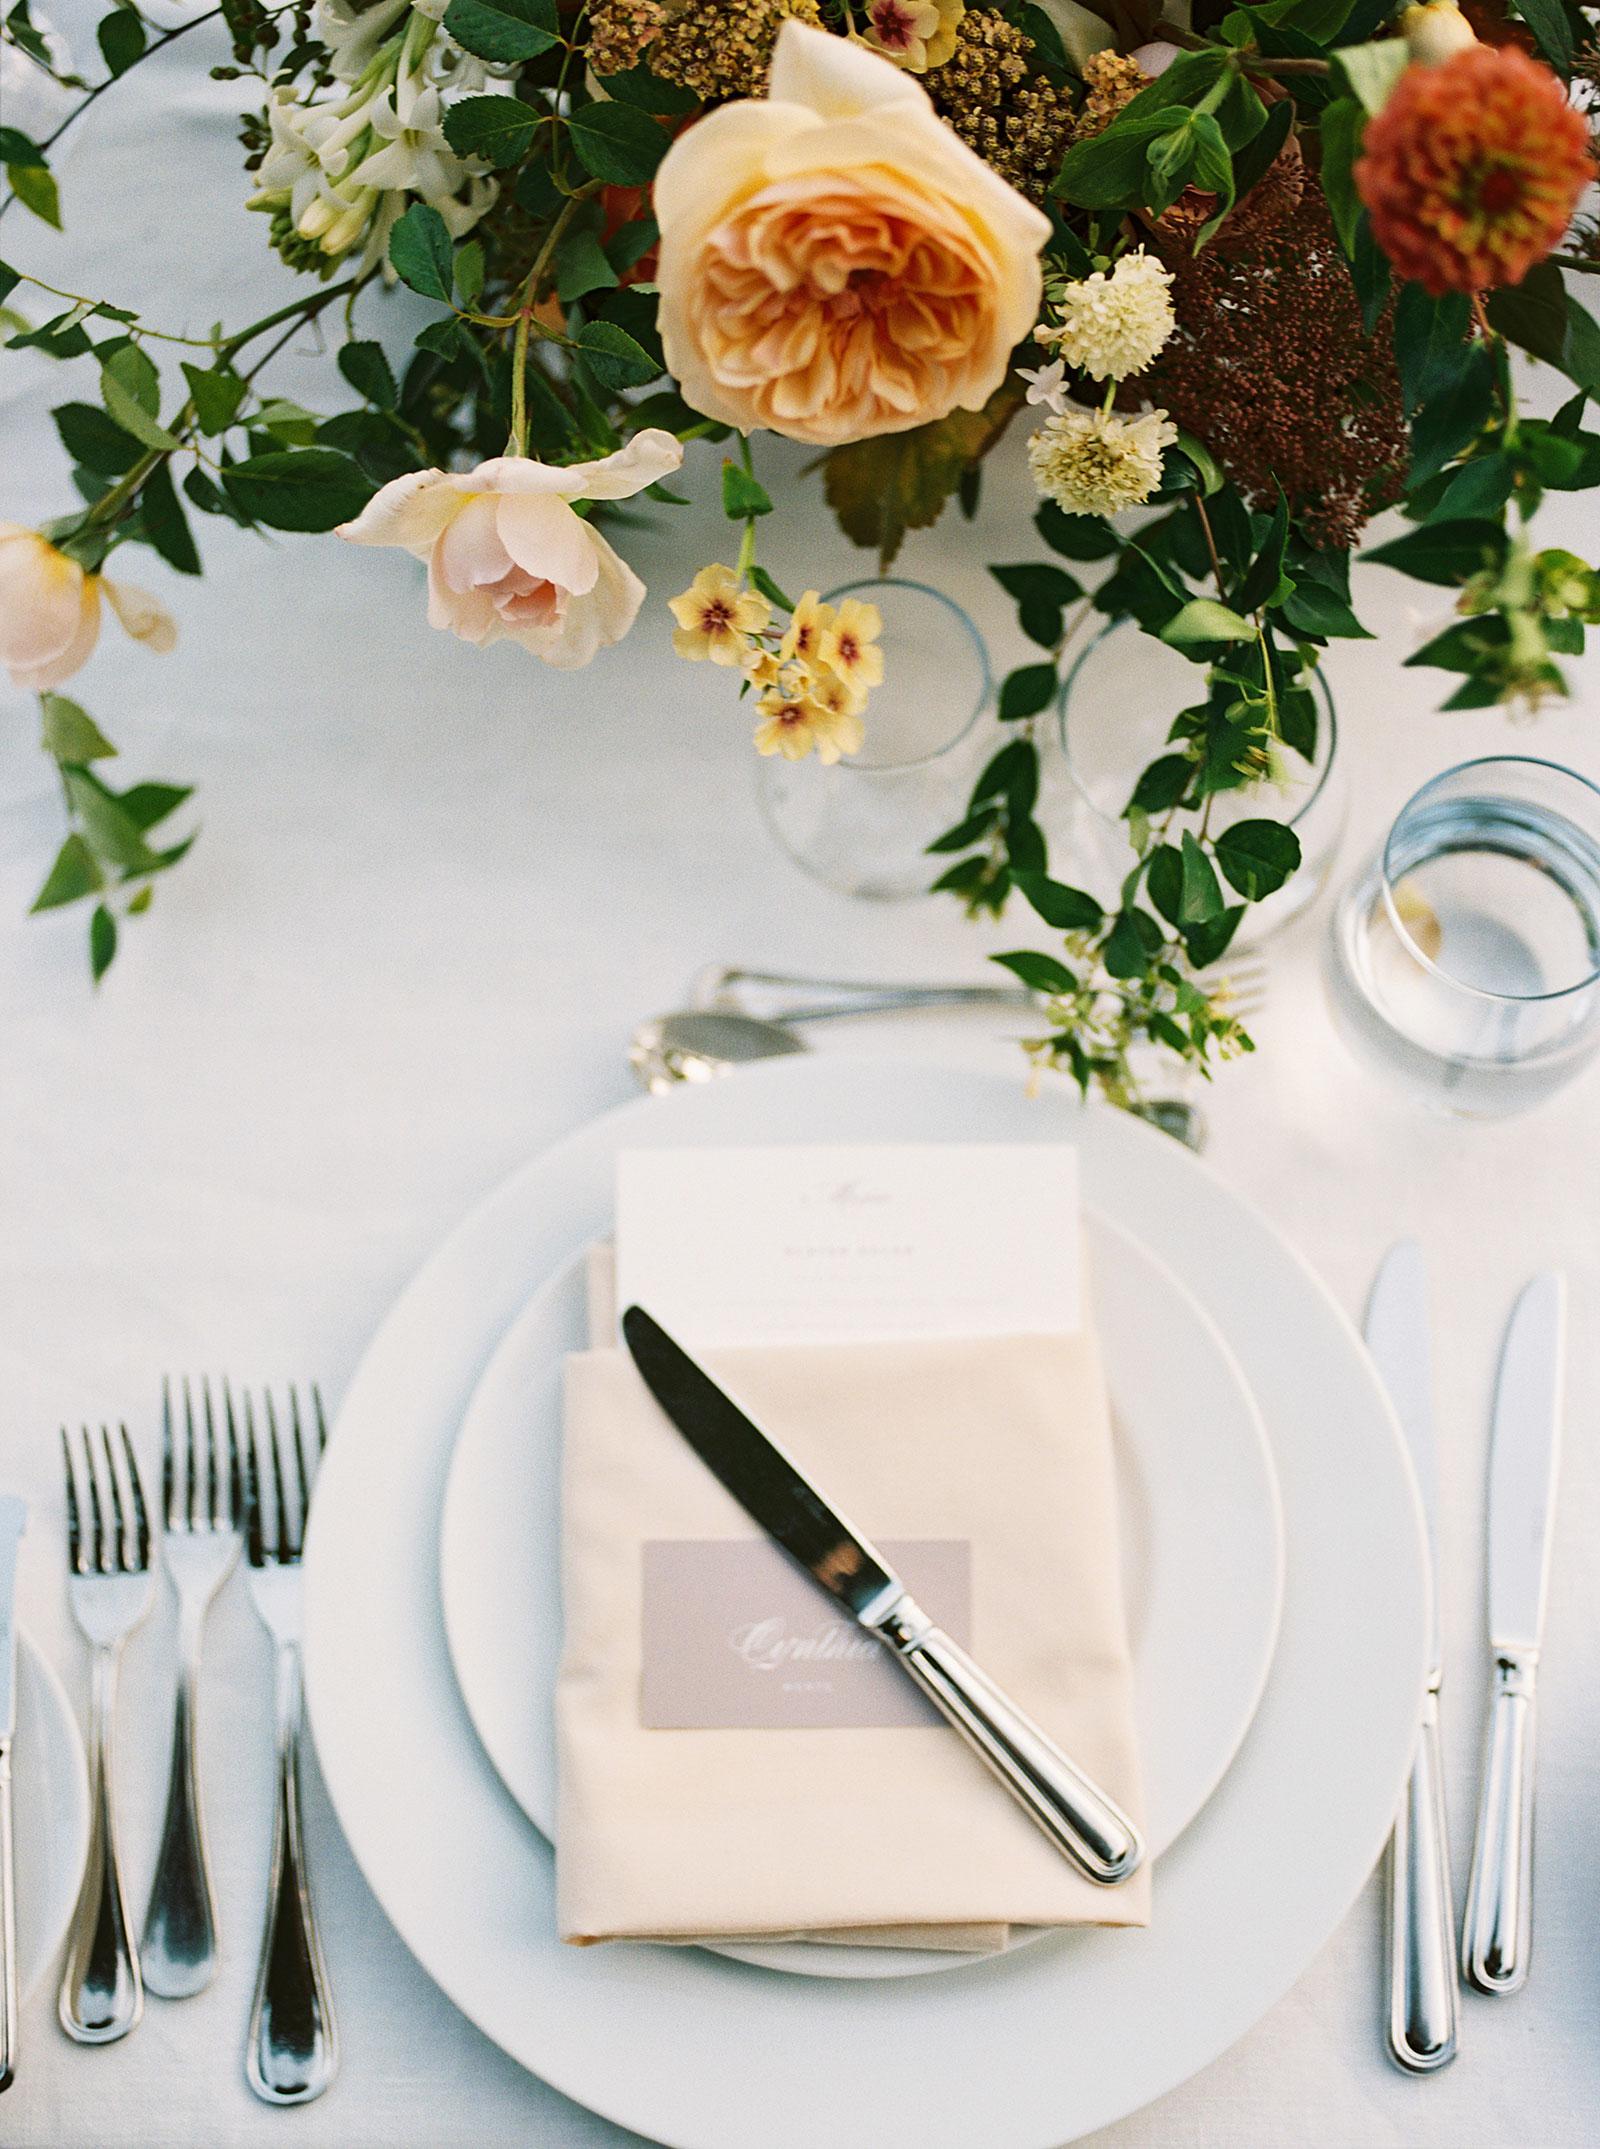 Calistoga-Ranch-Wedding-Table1